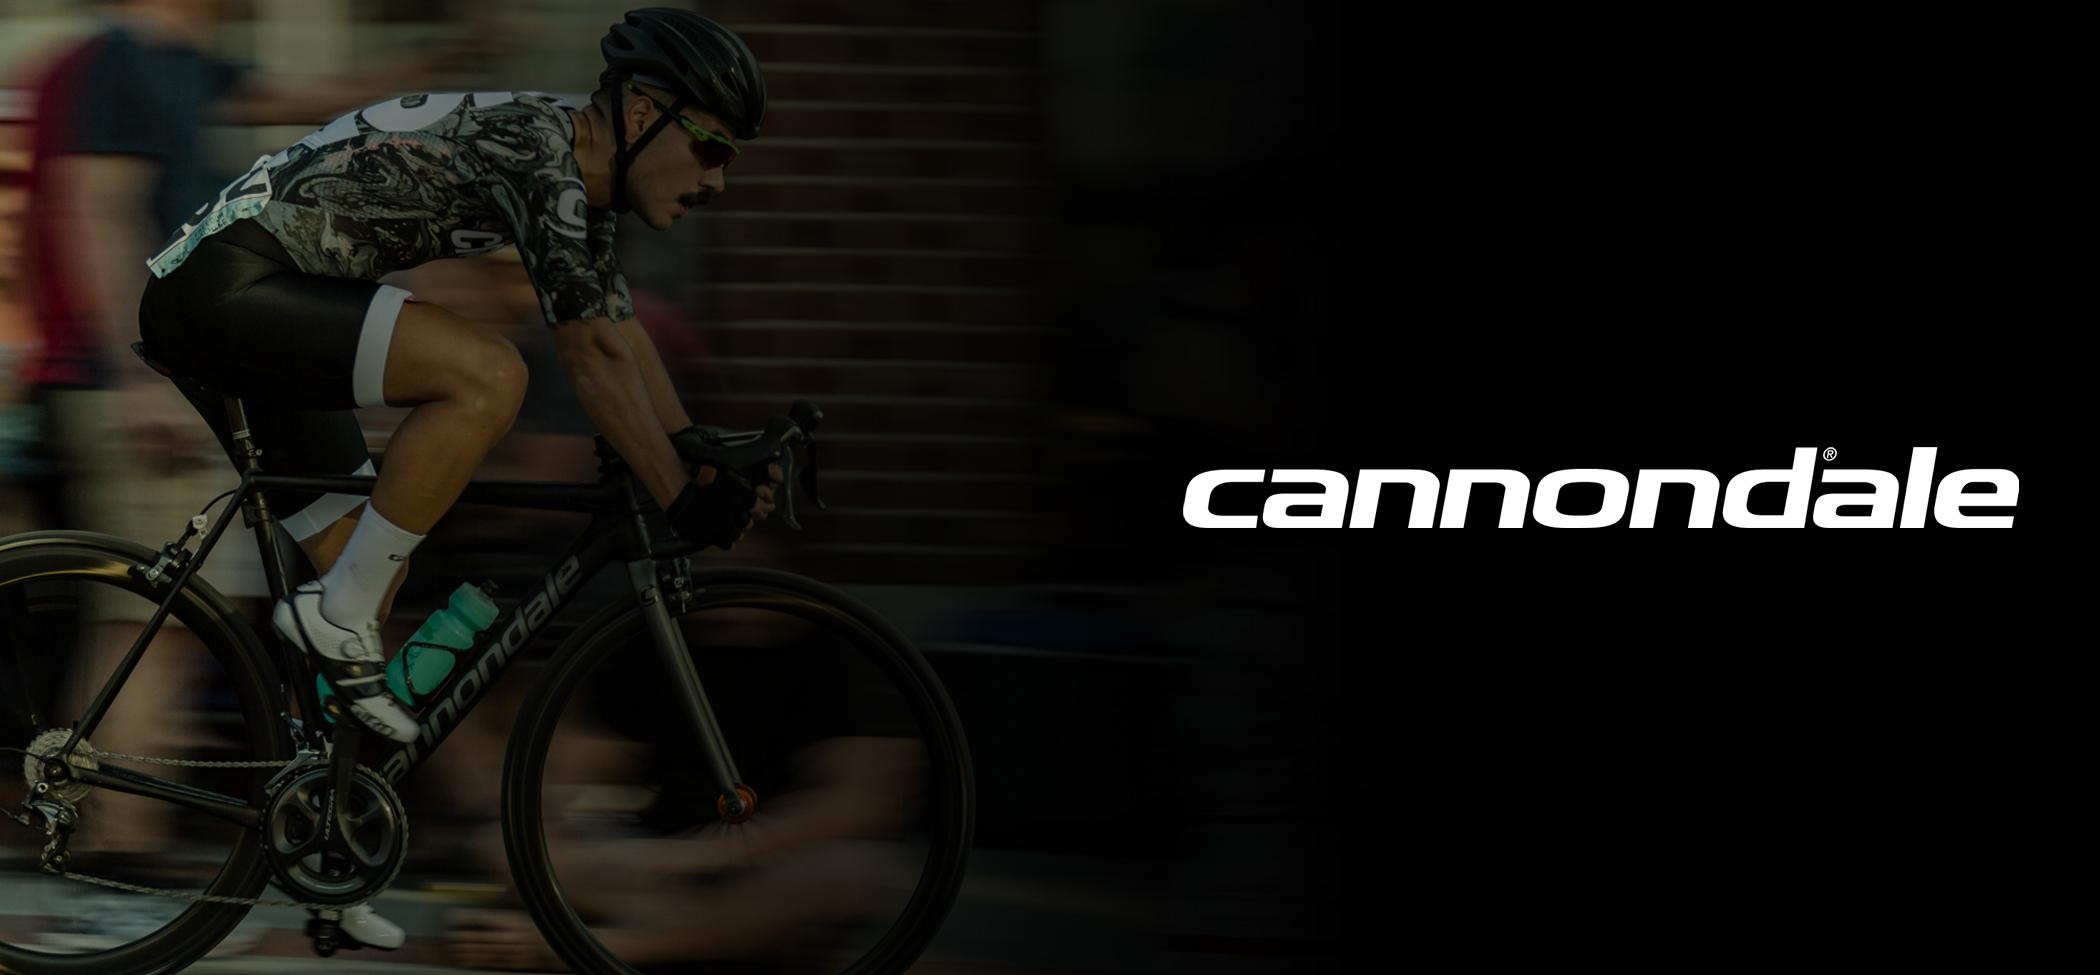 cannondale.jpg